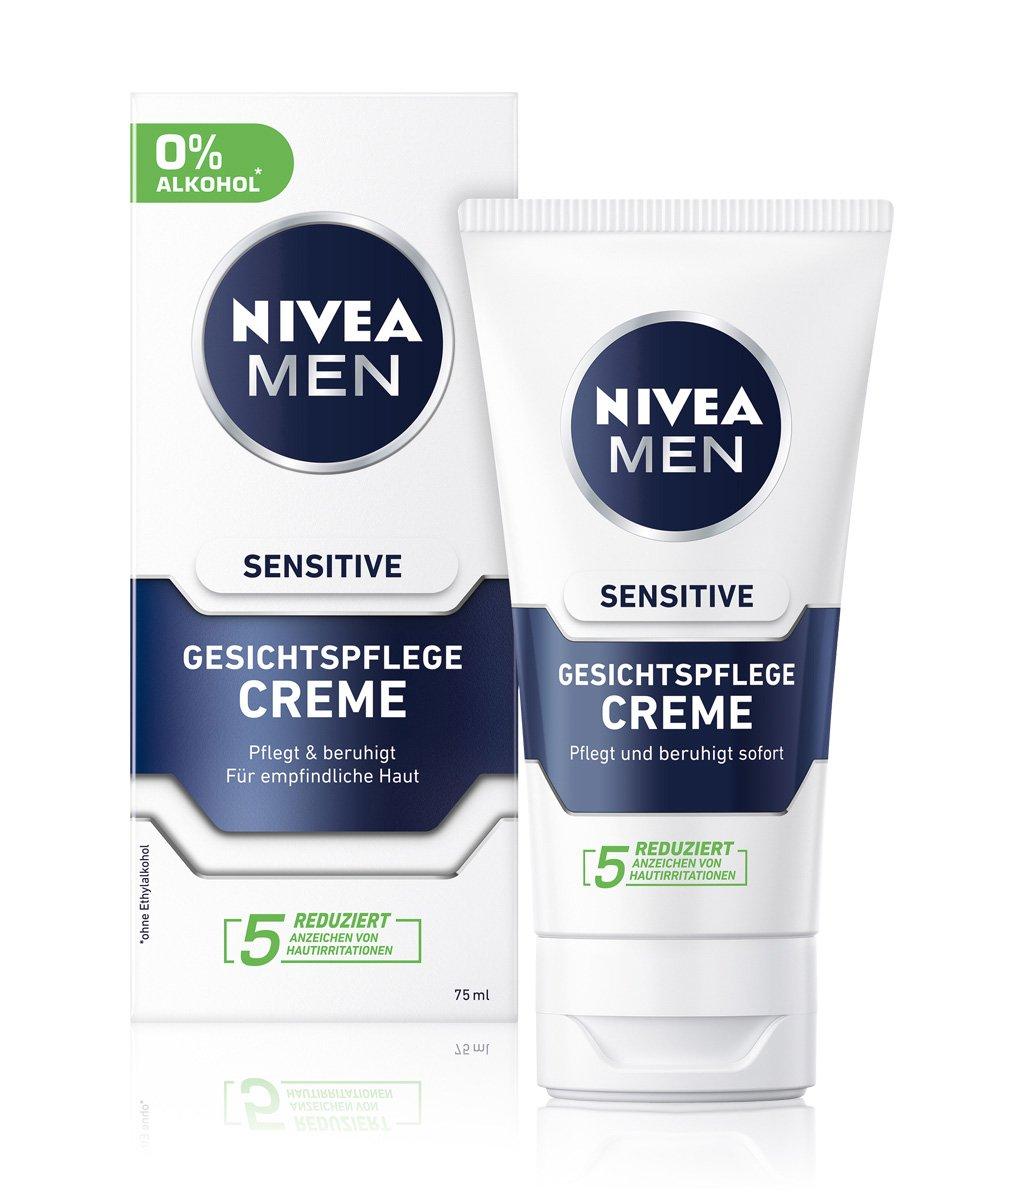 NIVEA Glow Gesichtspflege-Serie